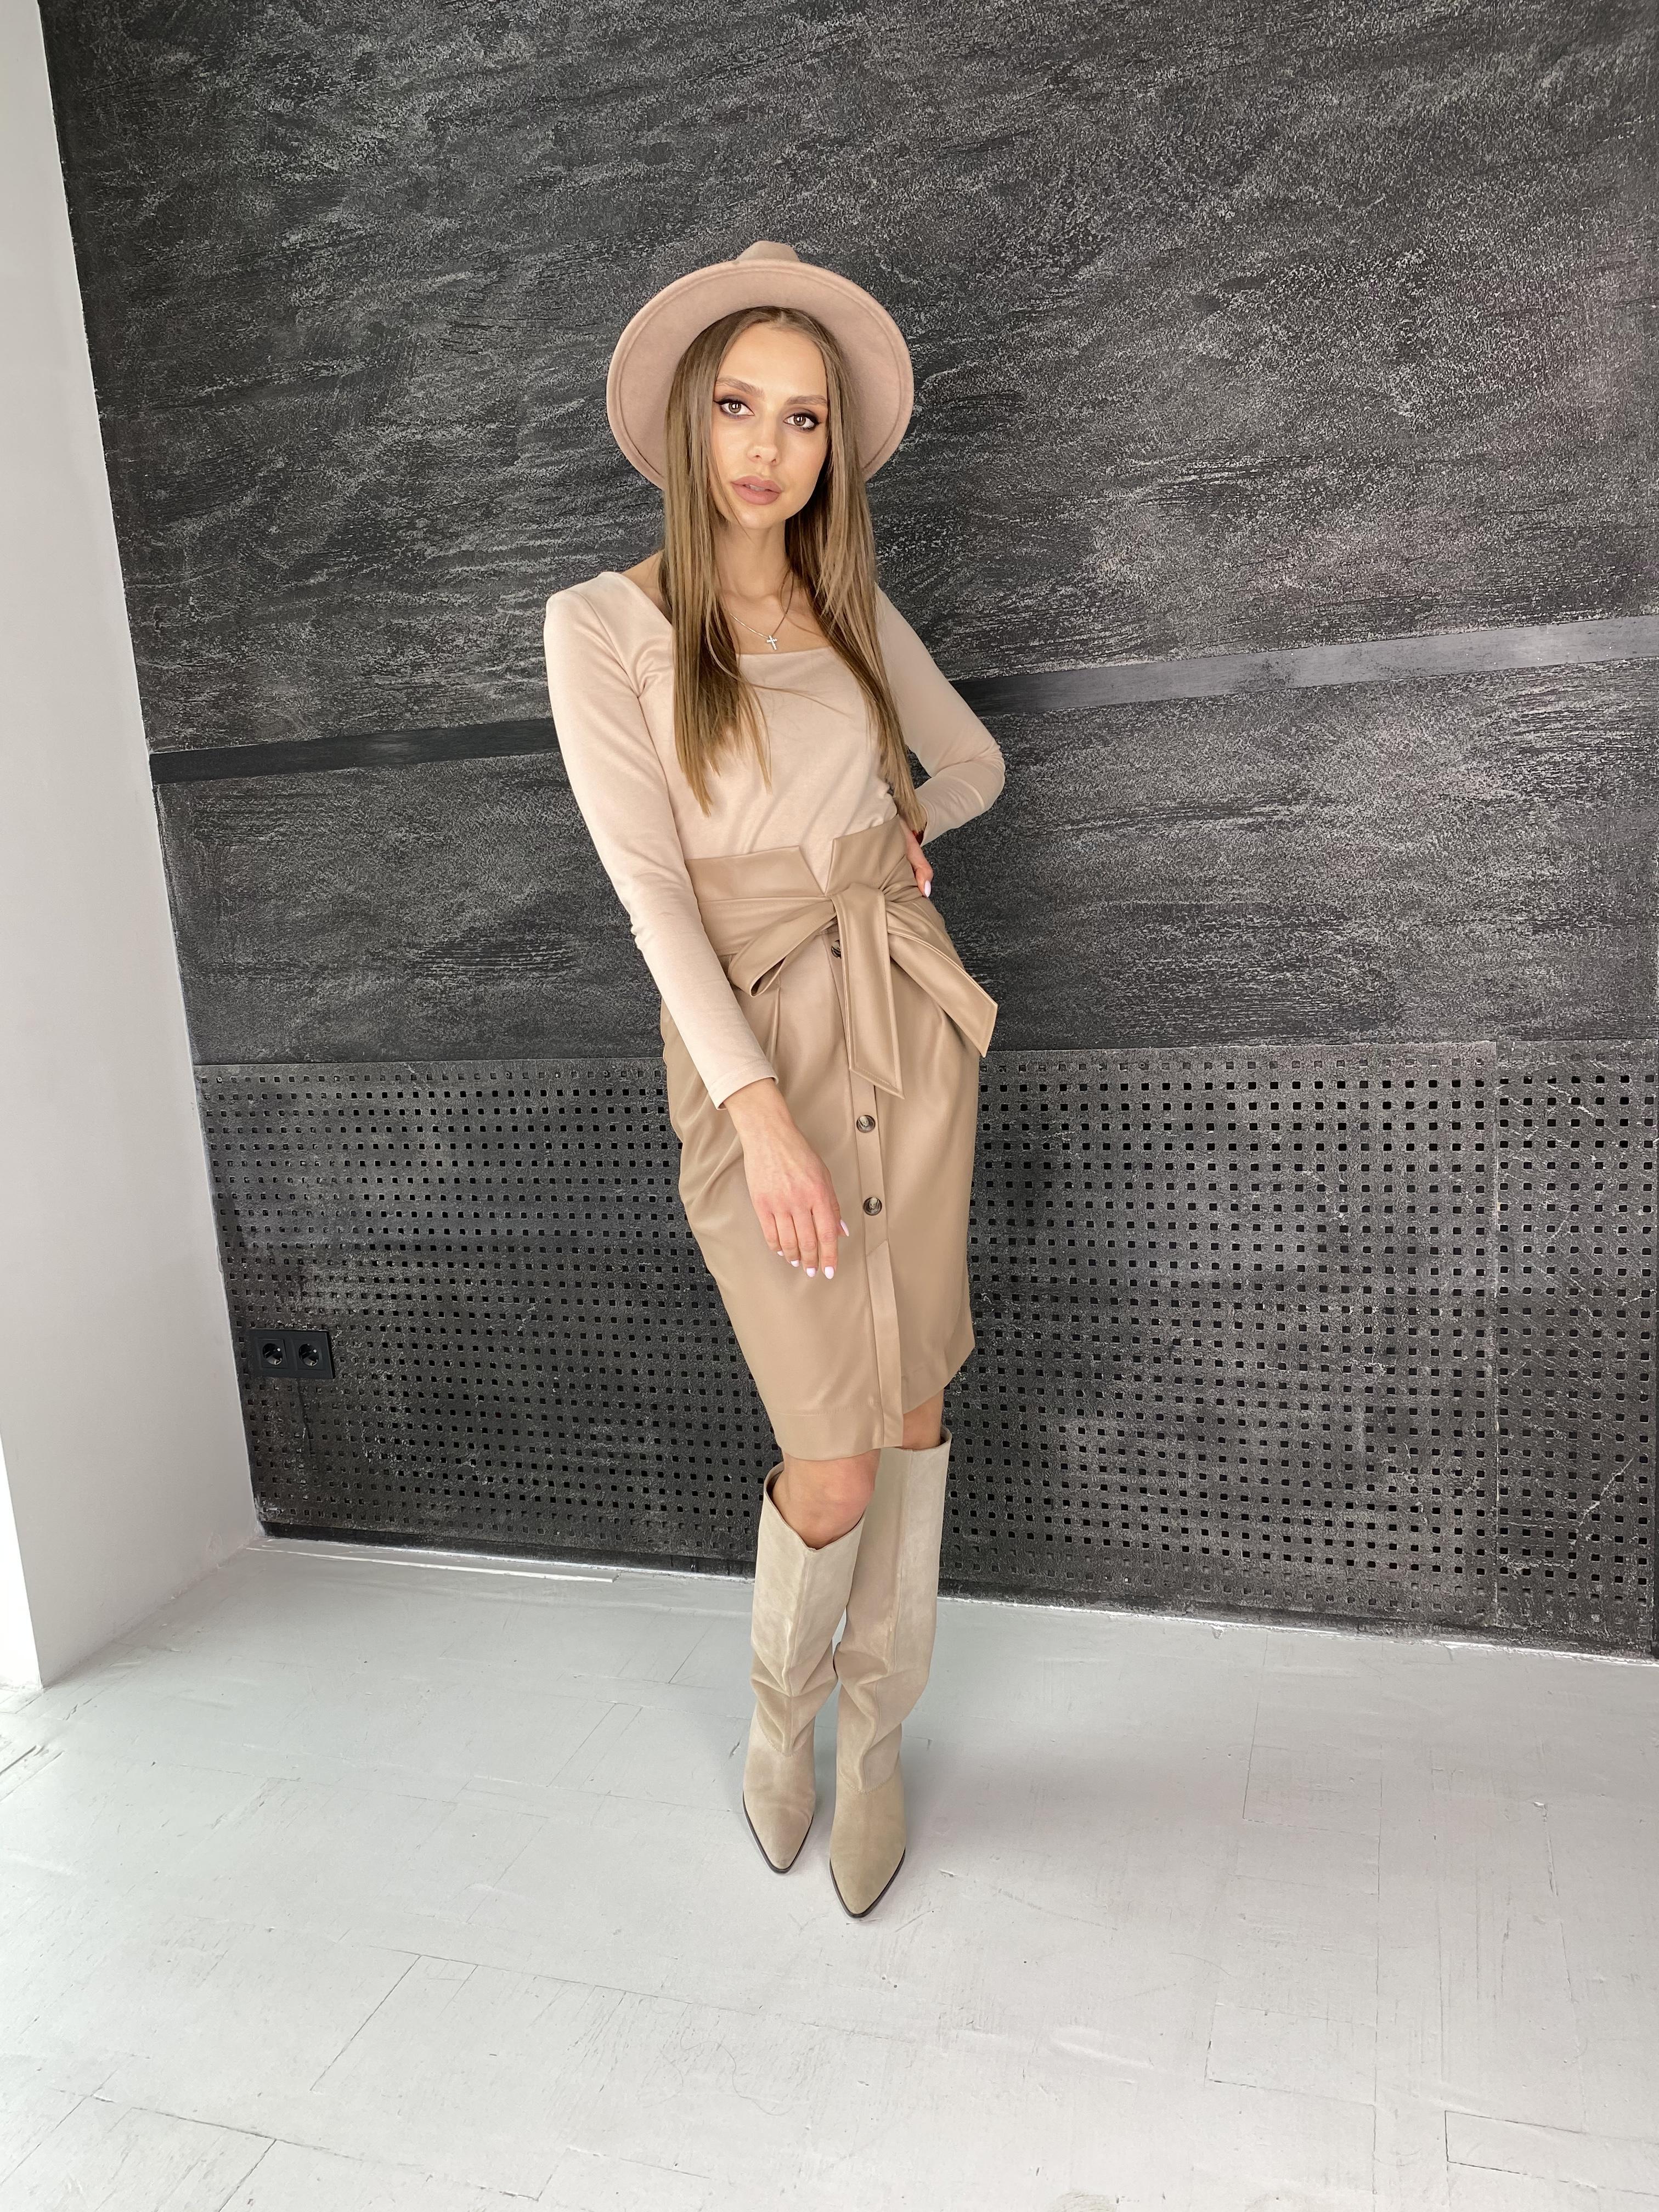 Марси юбка из экокожи 7913 АРТ. 46105 Цвет: Бежевый - фото 2, интернет магазин tm-modus.ru